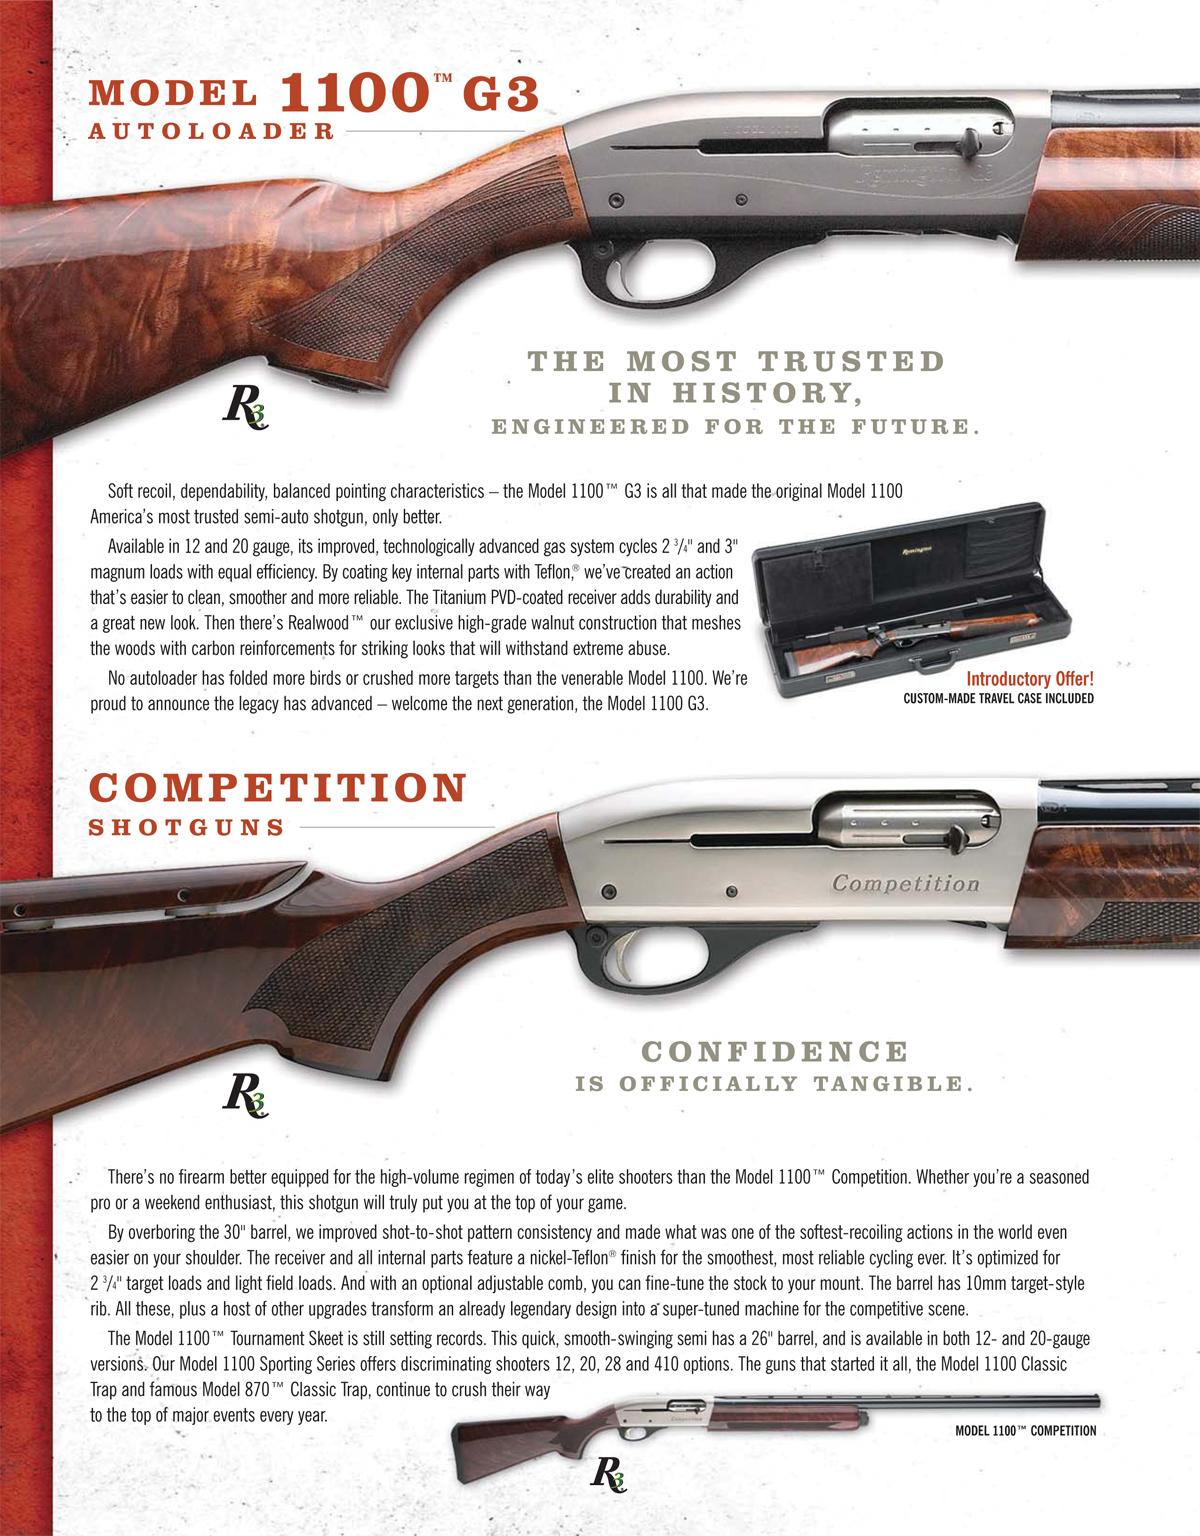 Remington 1100 G3 Parts Diagram Automotive Wiring 20ga Sporting Rh 24 172 105 90 Model Replacement